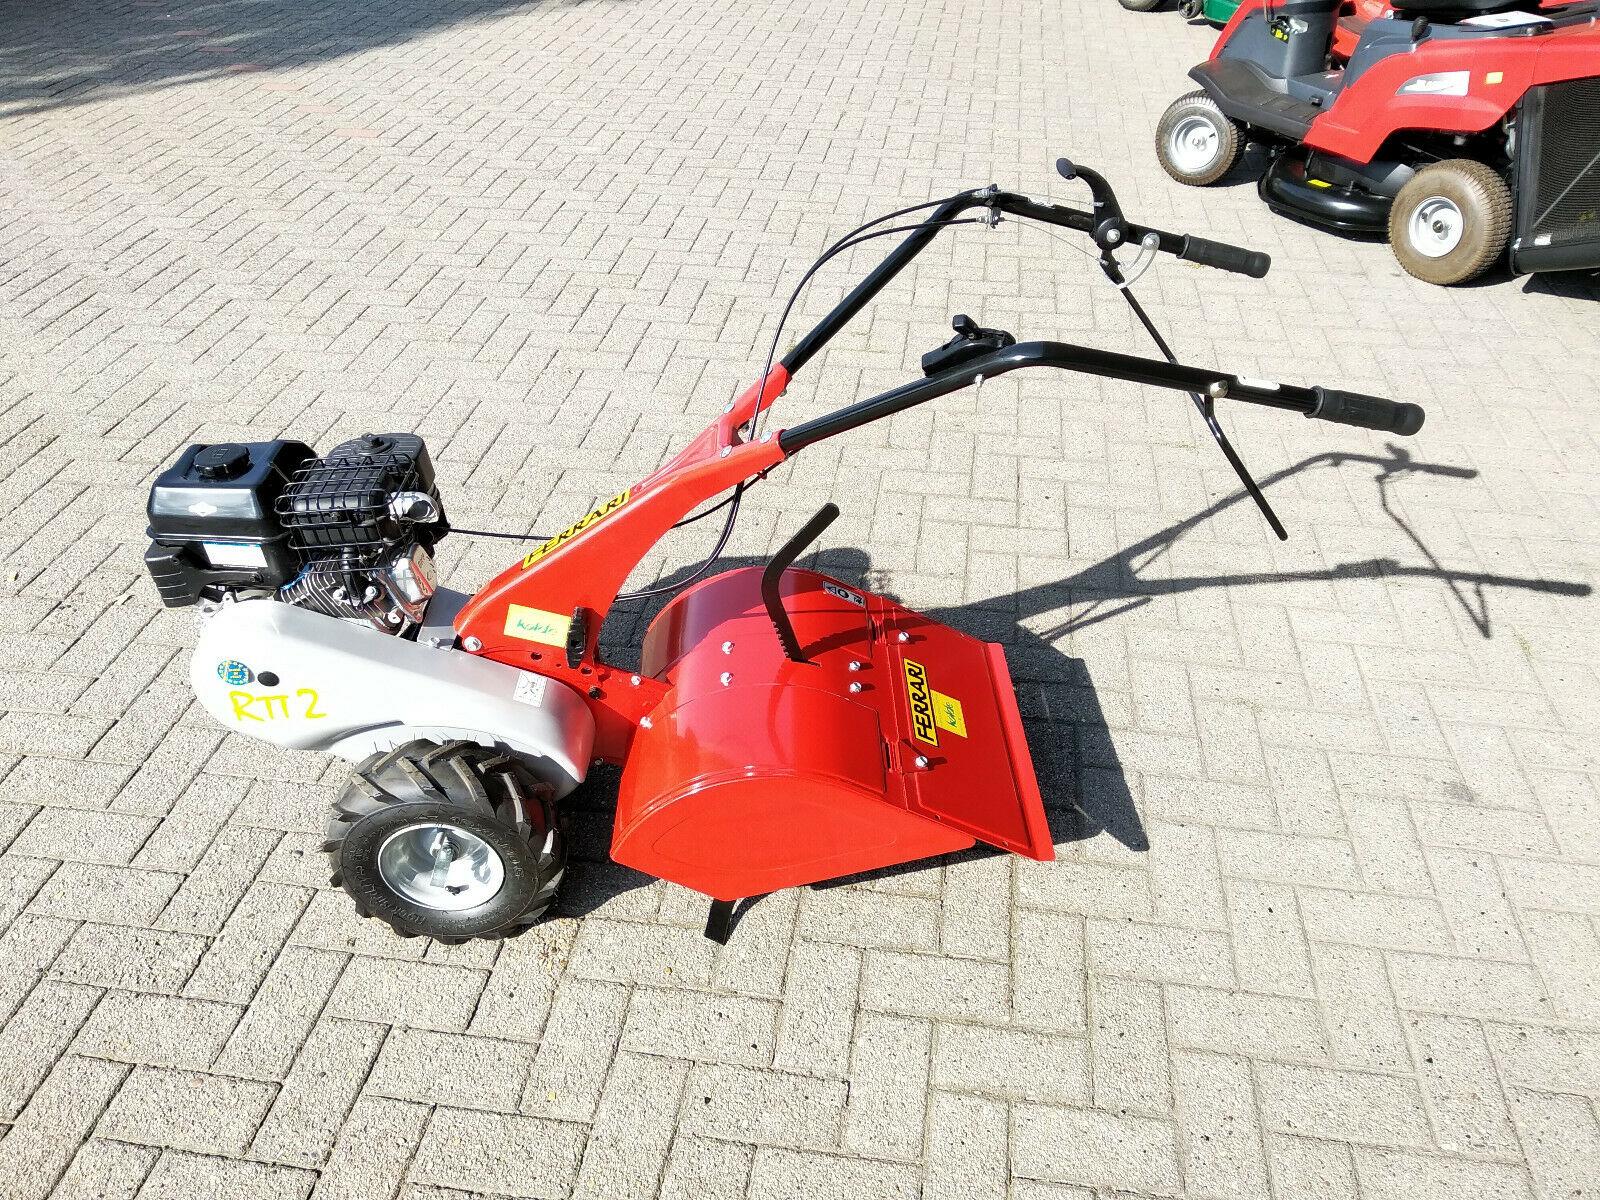 Ferrari / Eurosystems RTT2 Fräse Einachser